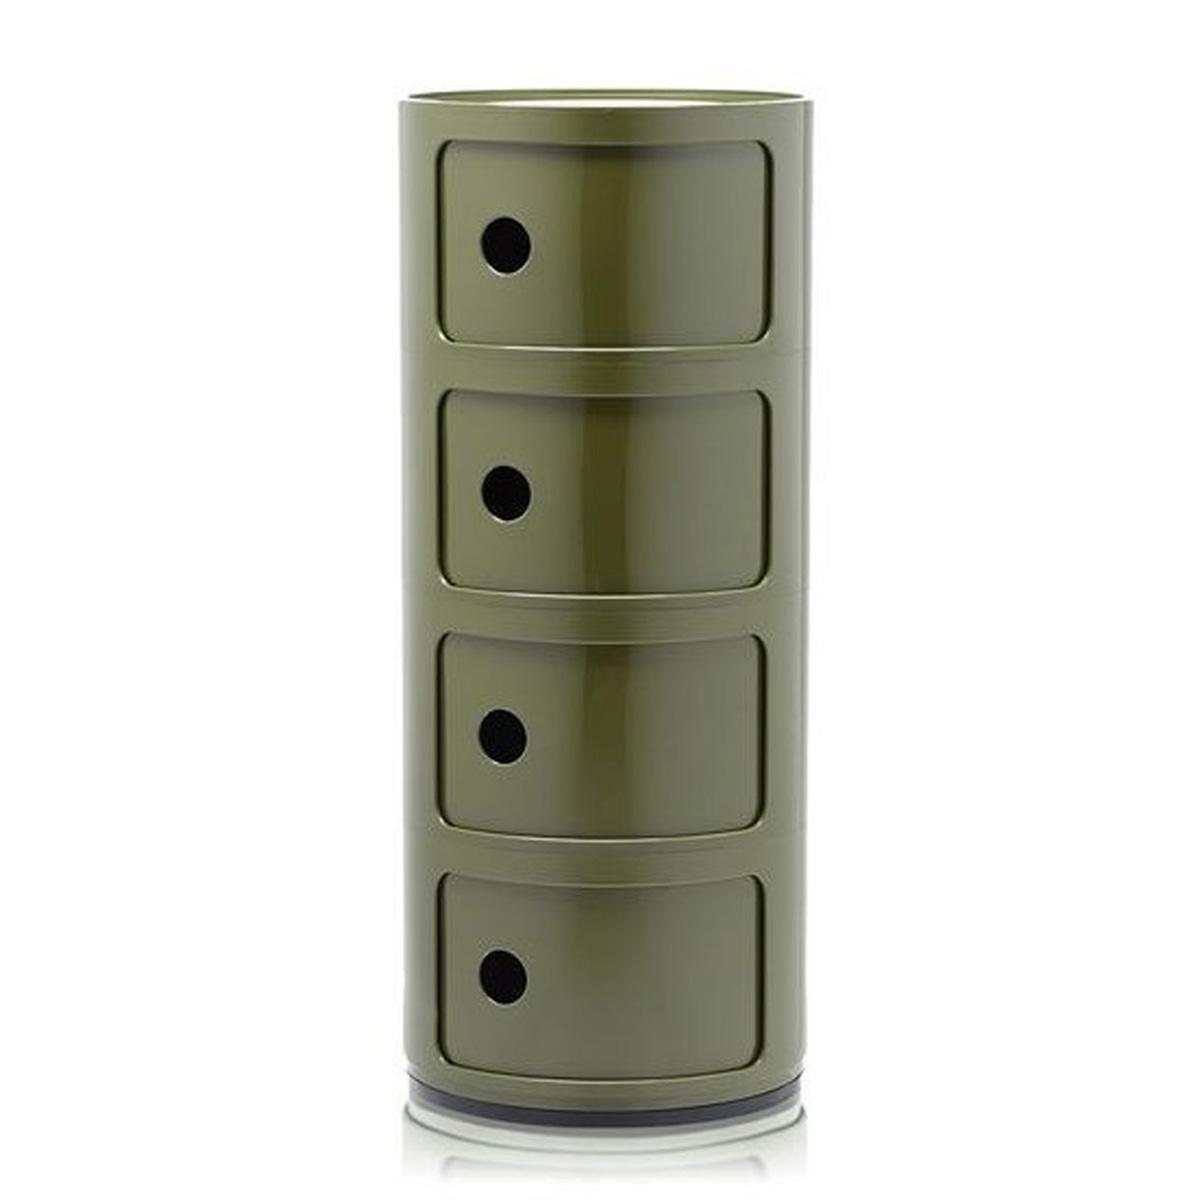 Polica Componibili/4 zelena 4985/18